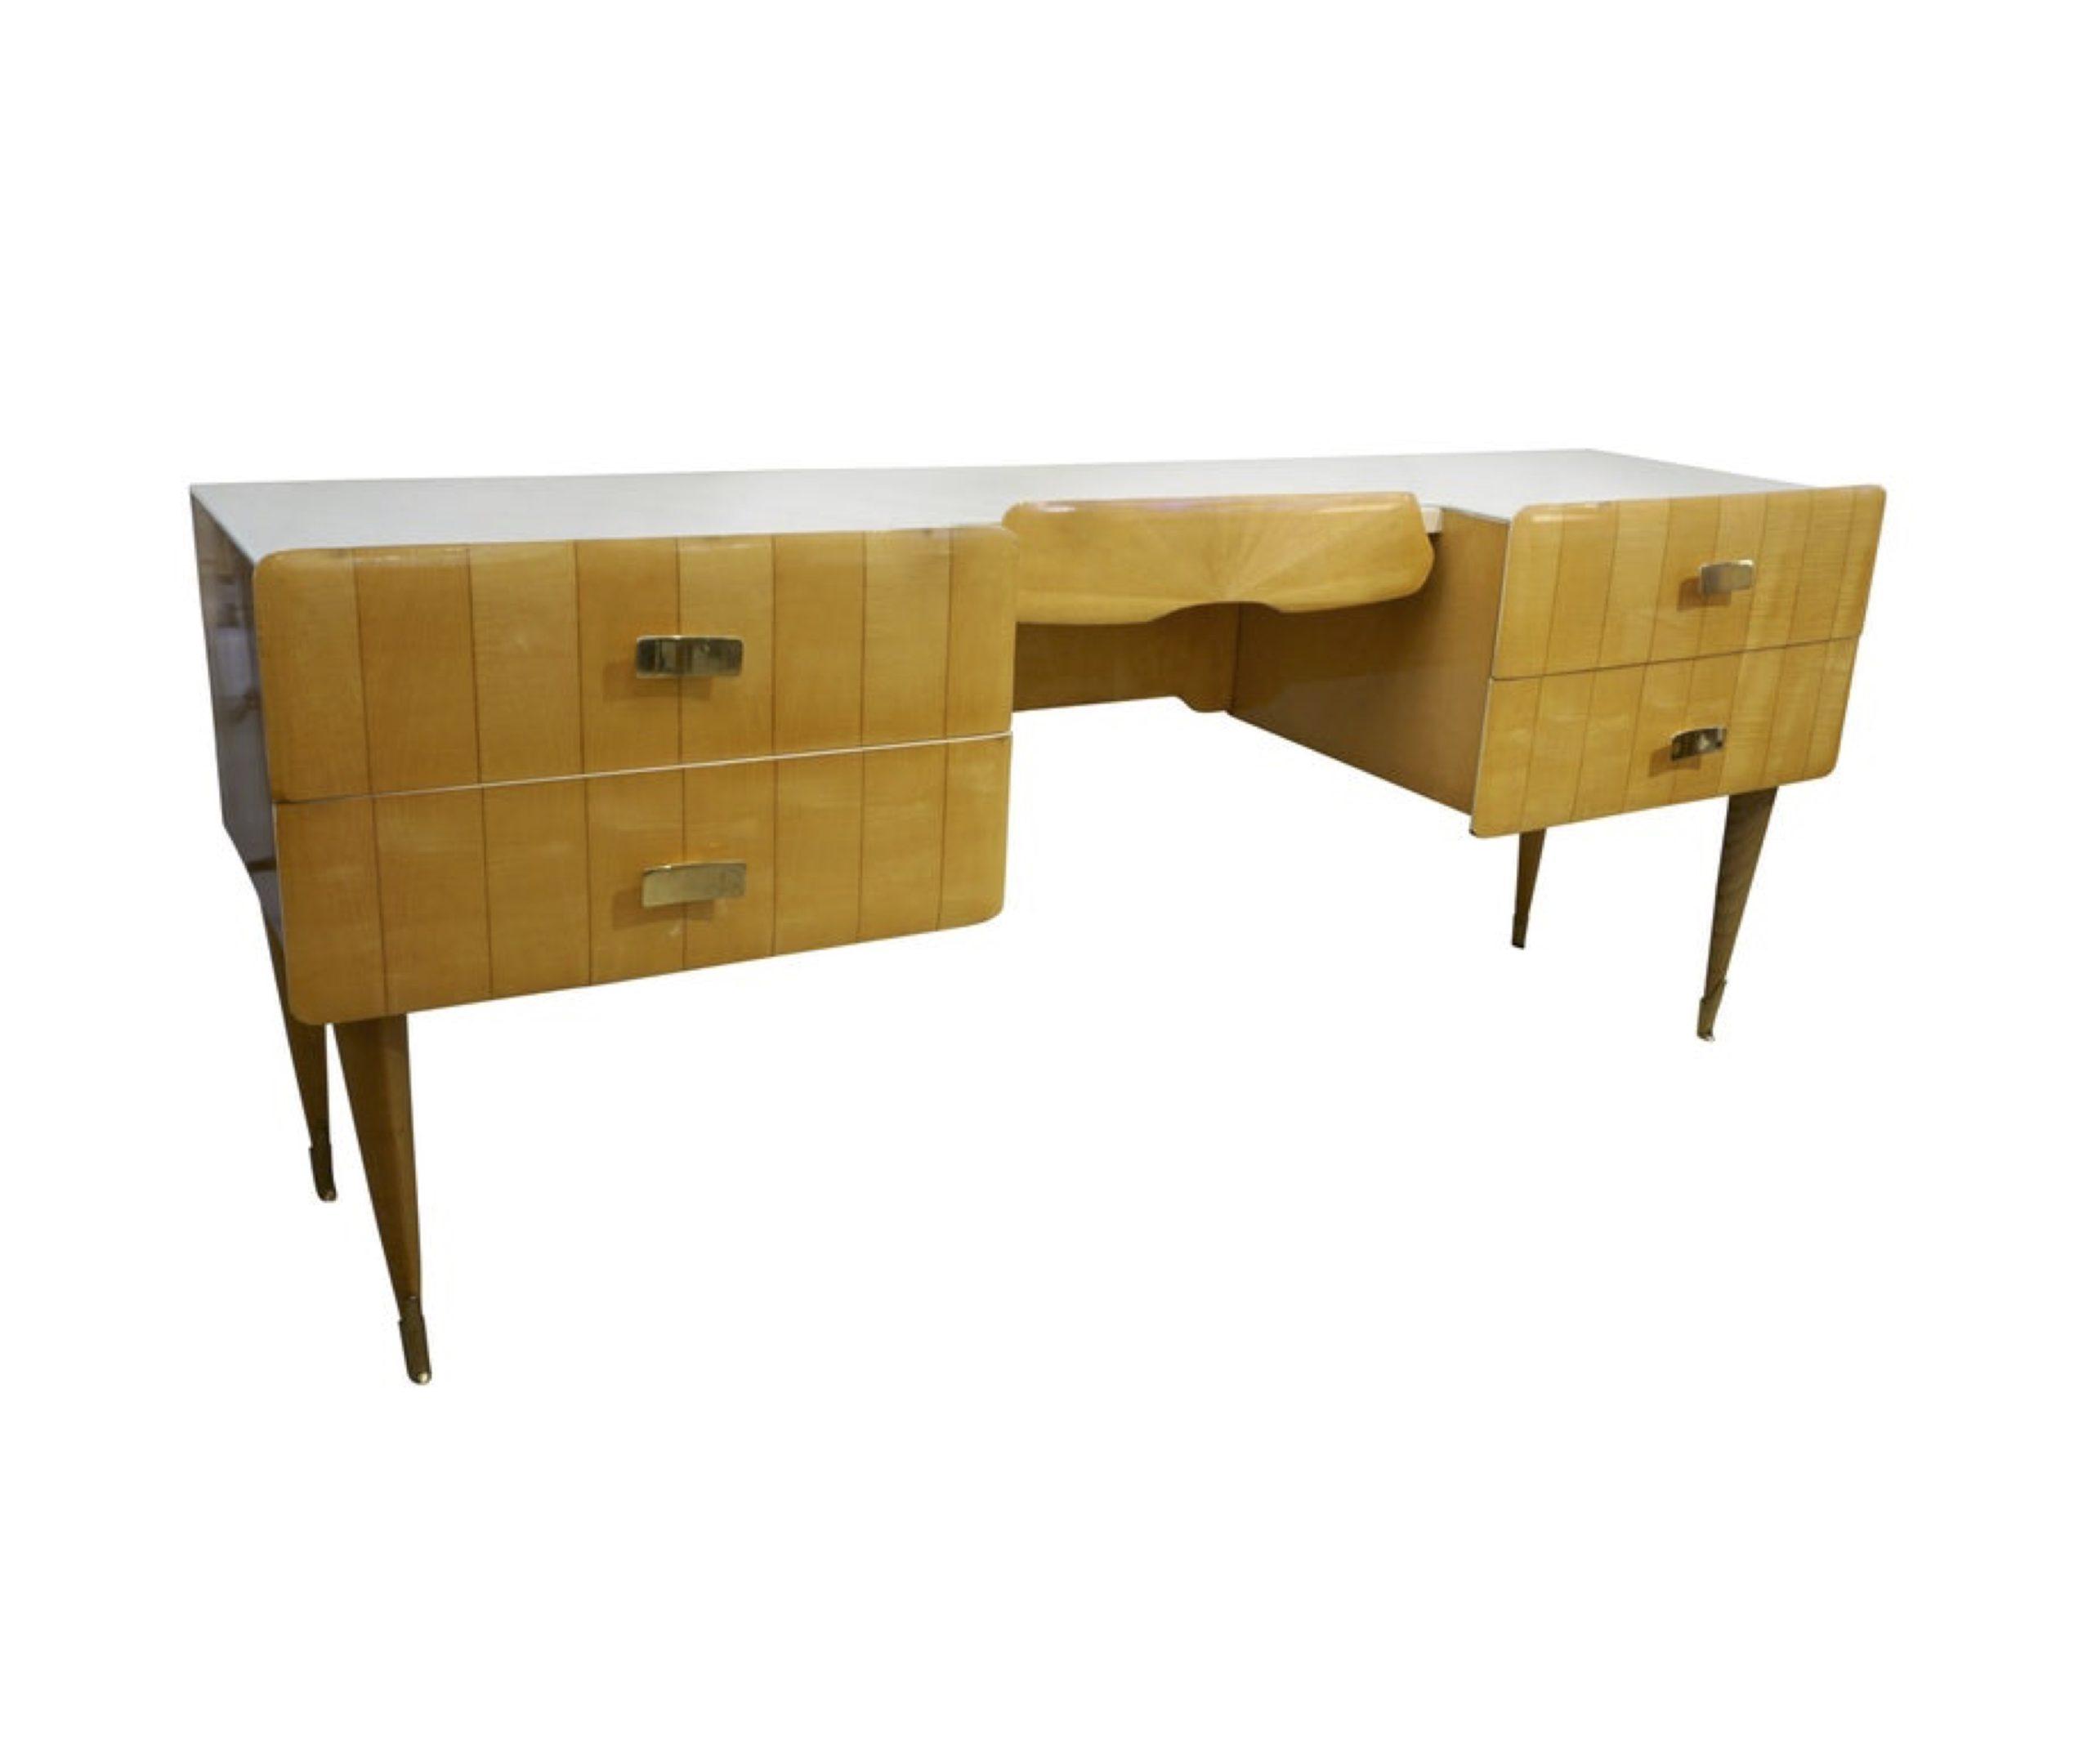 cosulich_interiors_and_antiques_products_new_york_design_center_1950s_pier_luigi_colli_vintage_italian_design_cream_honey_ashwood_modern_desk-scaled-1